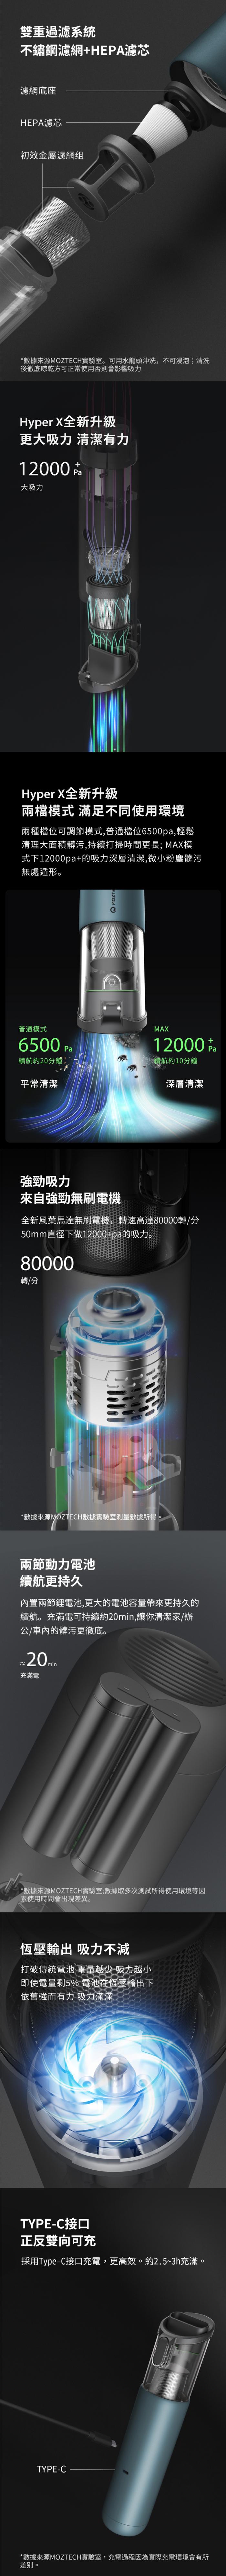 MOZTECH HYPER-X 萬用吸塵器